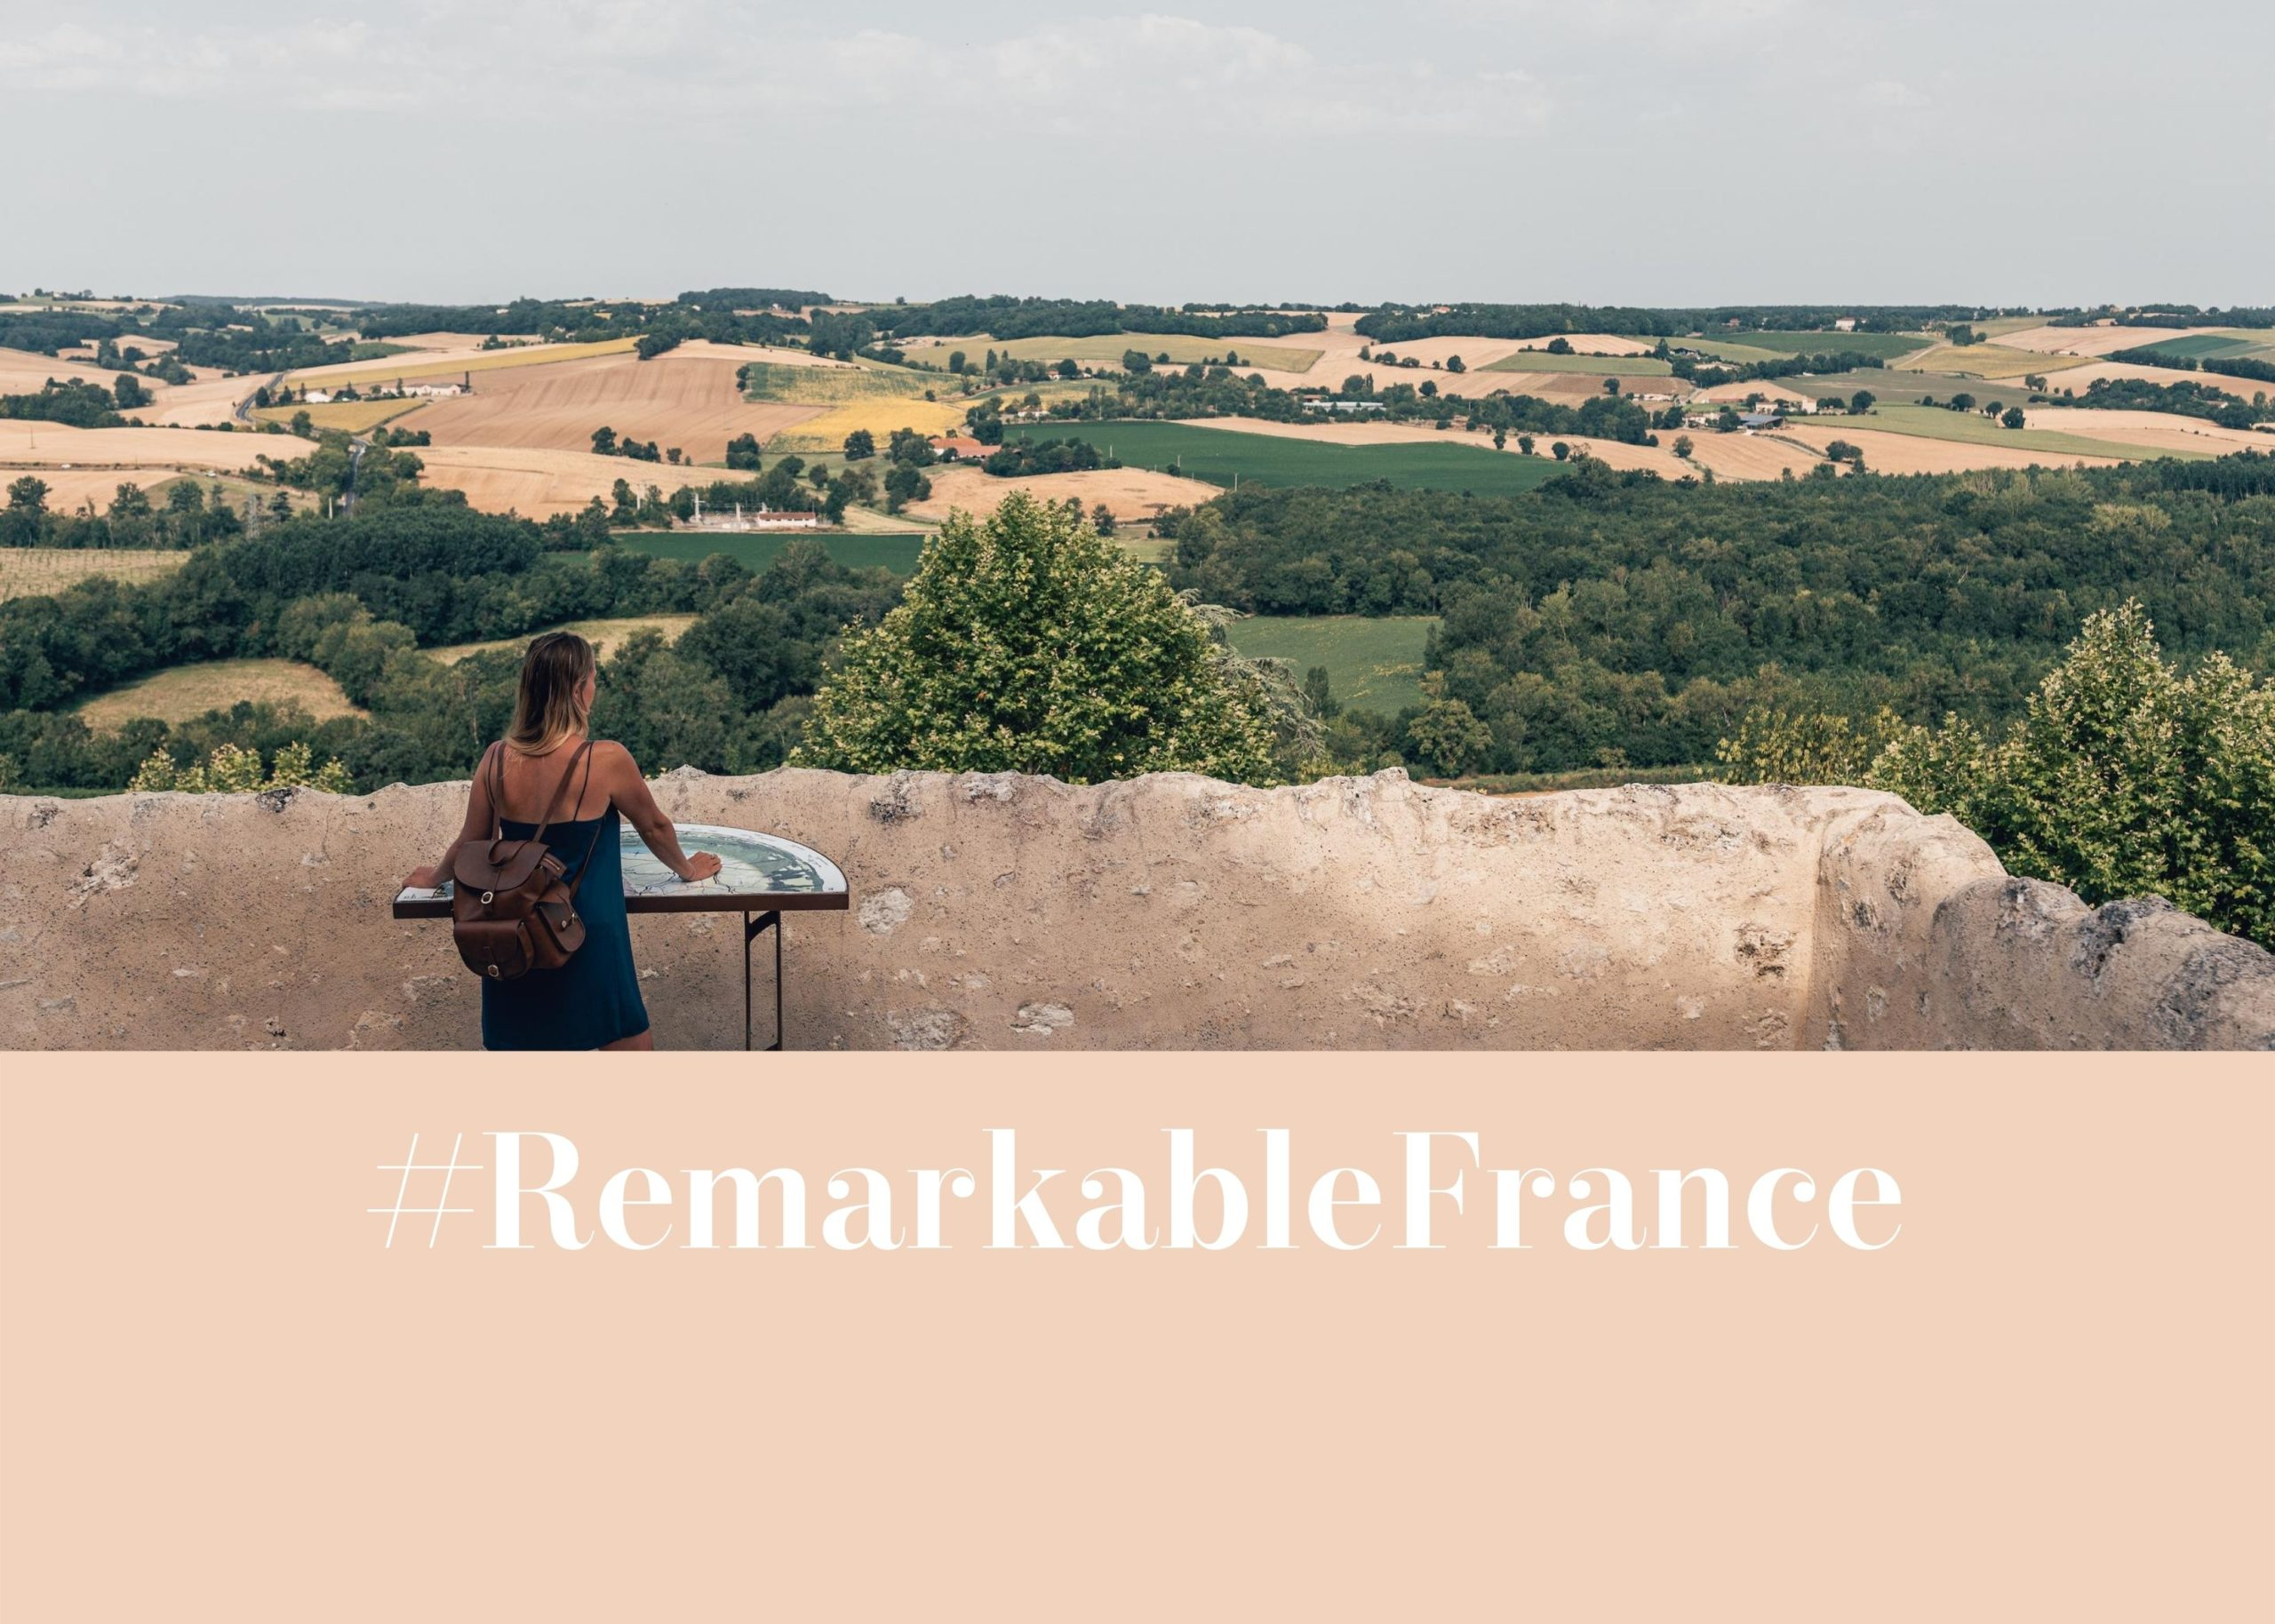 Ramarkable France